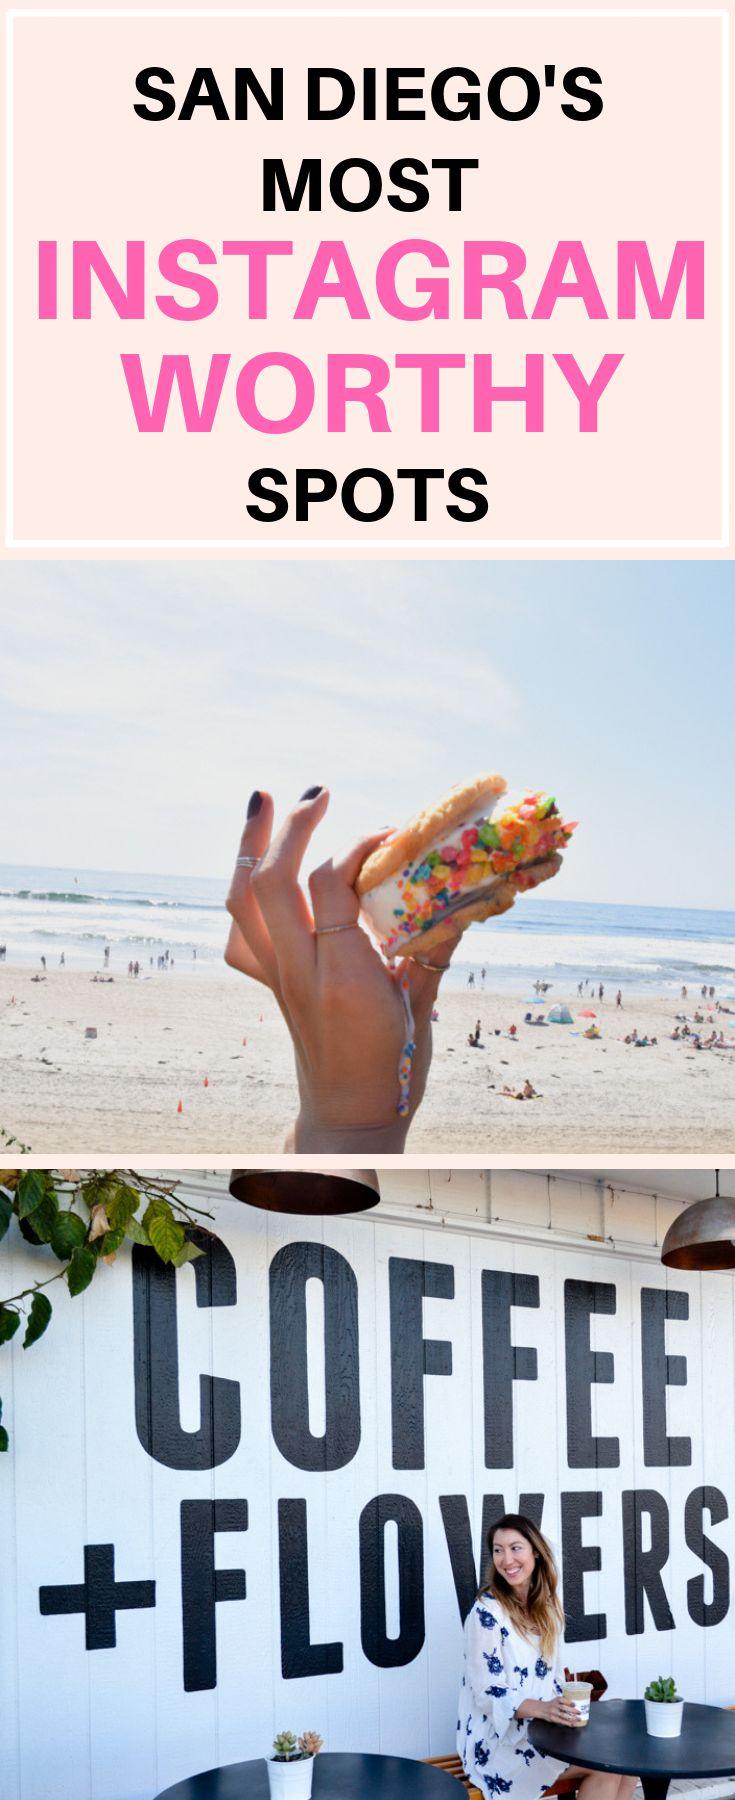 San Diego's Most Instagram Worthy Spots